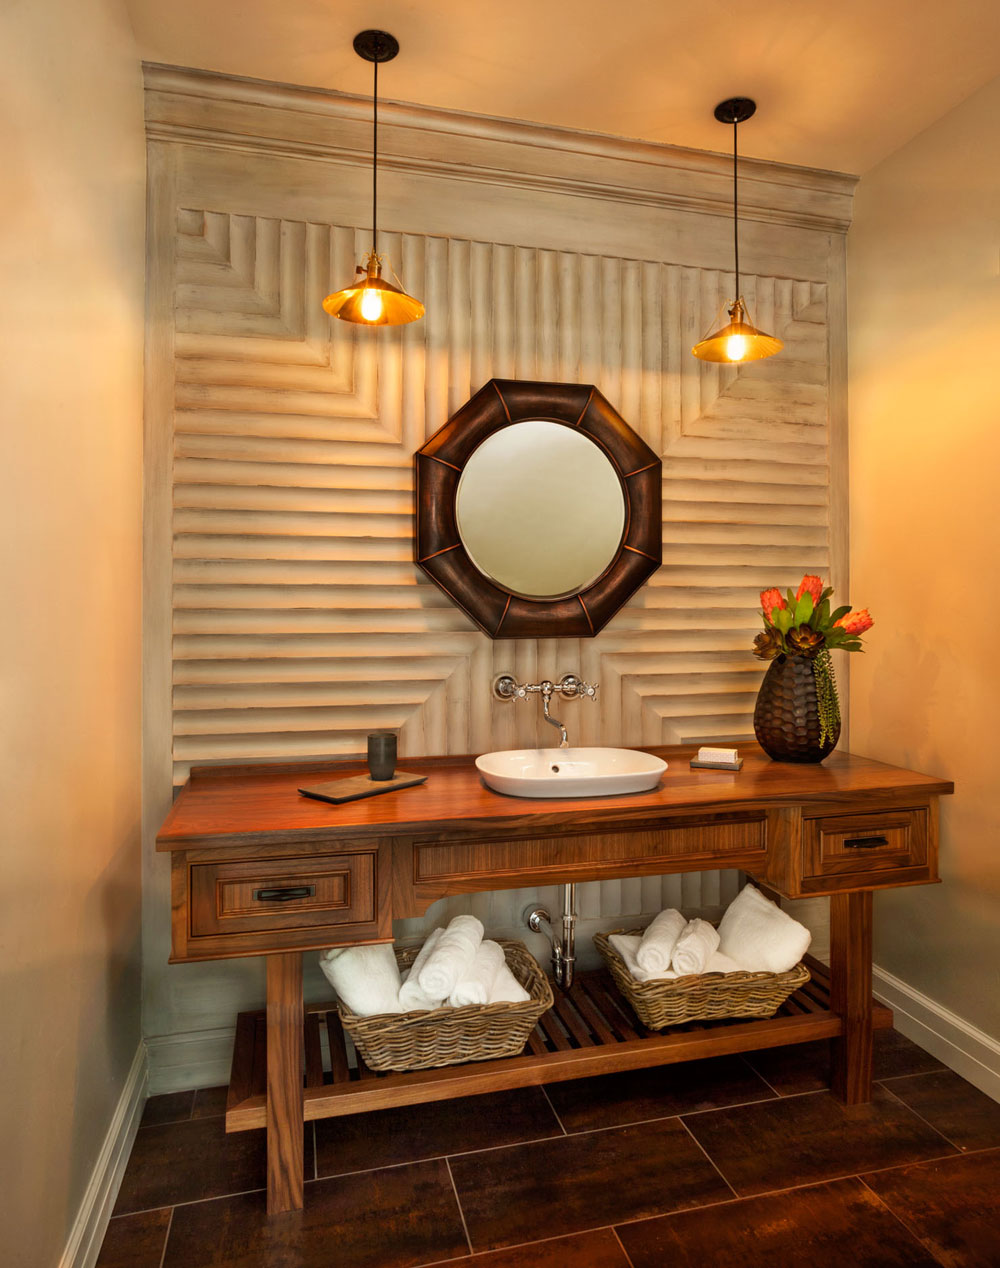 Ideas-of-feng-shui-interior-design-14 ideas-of-feng shui-interior design